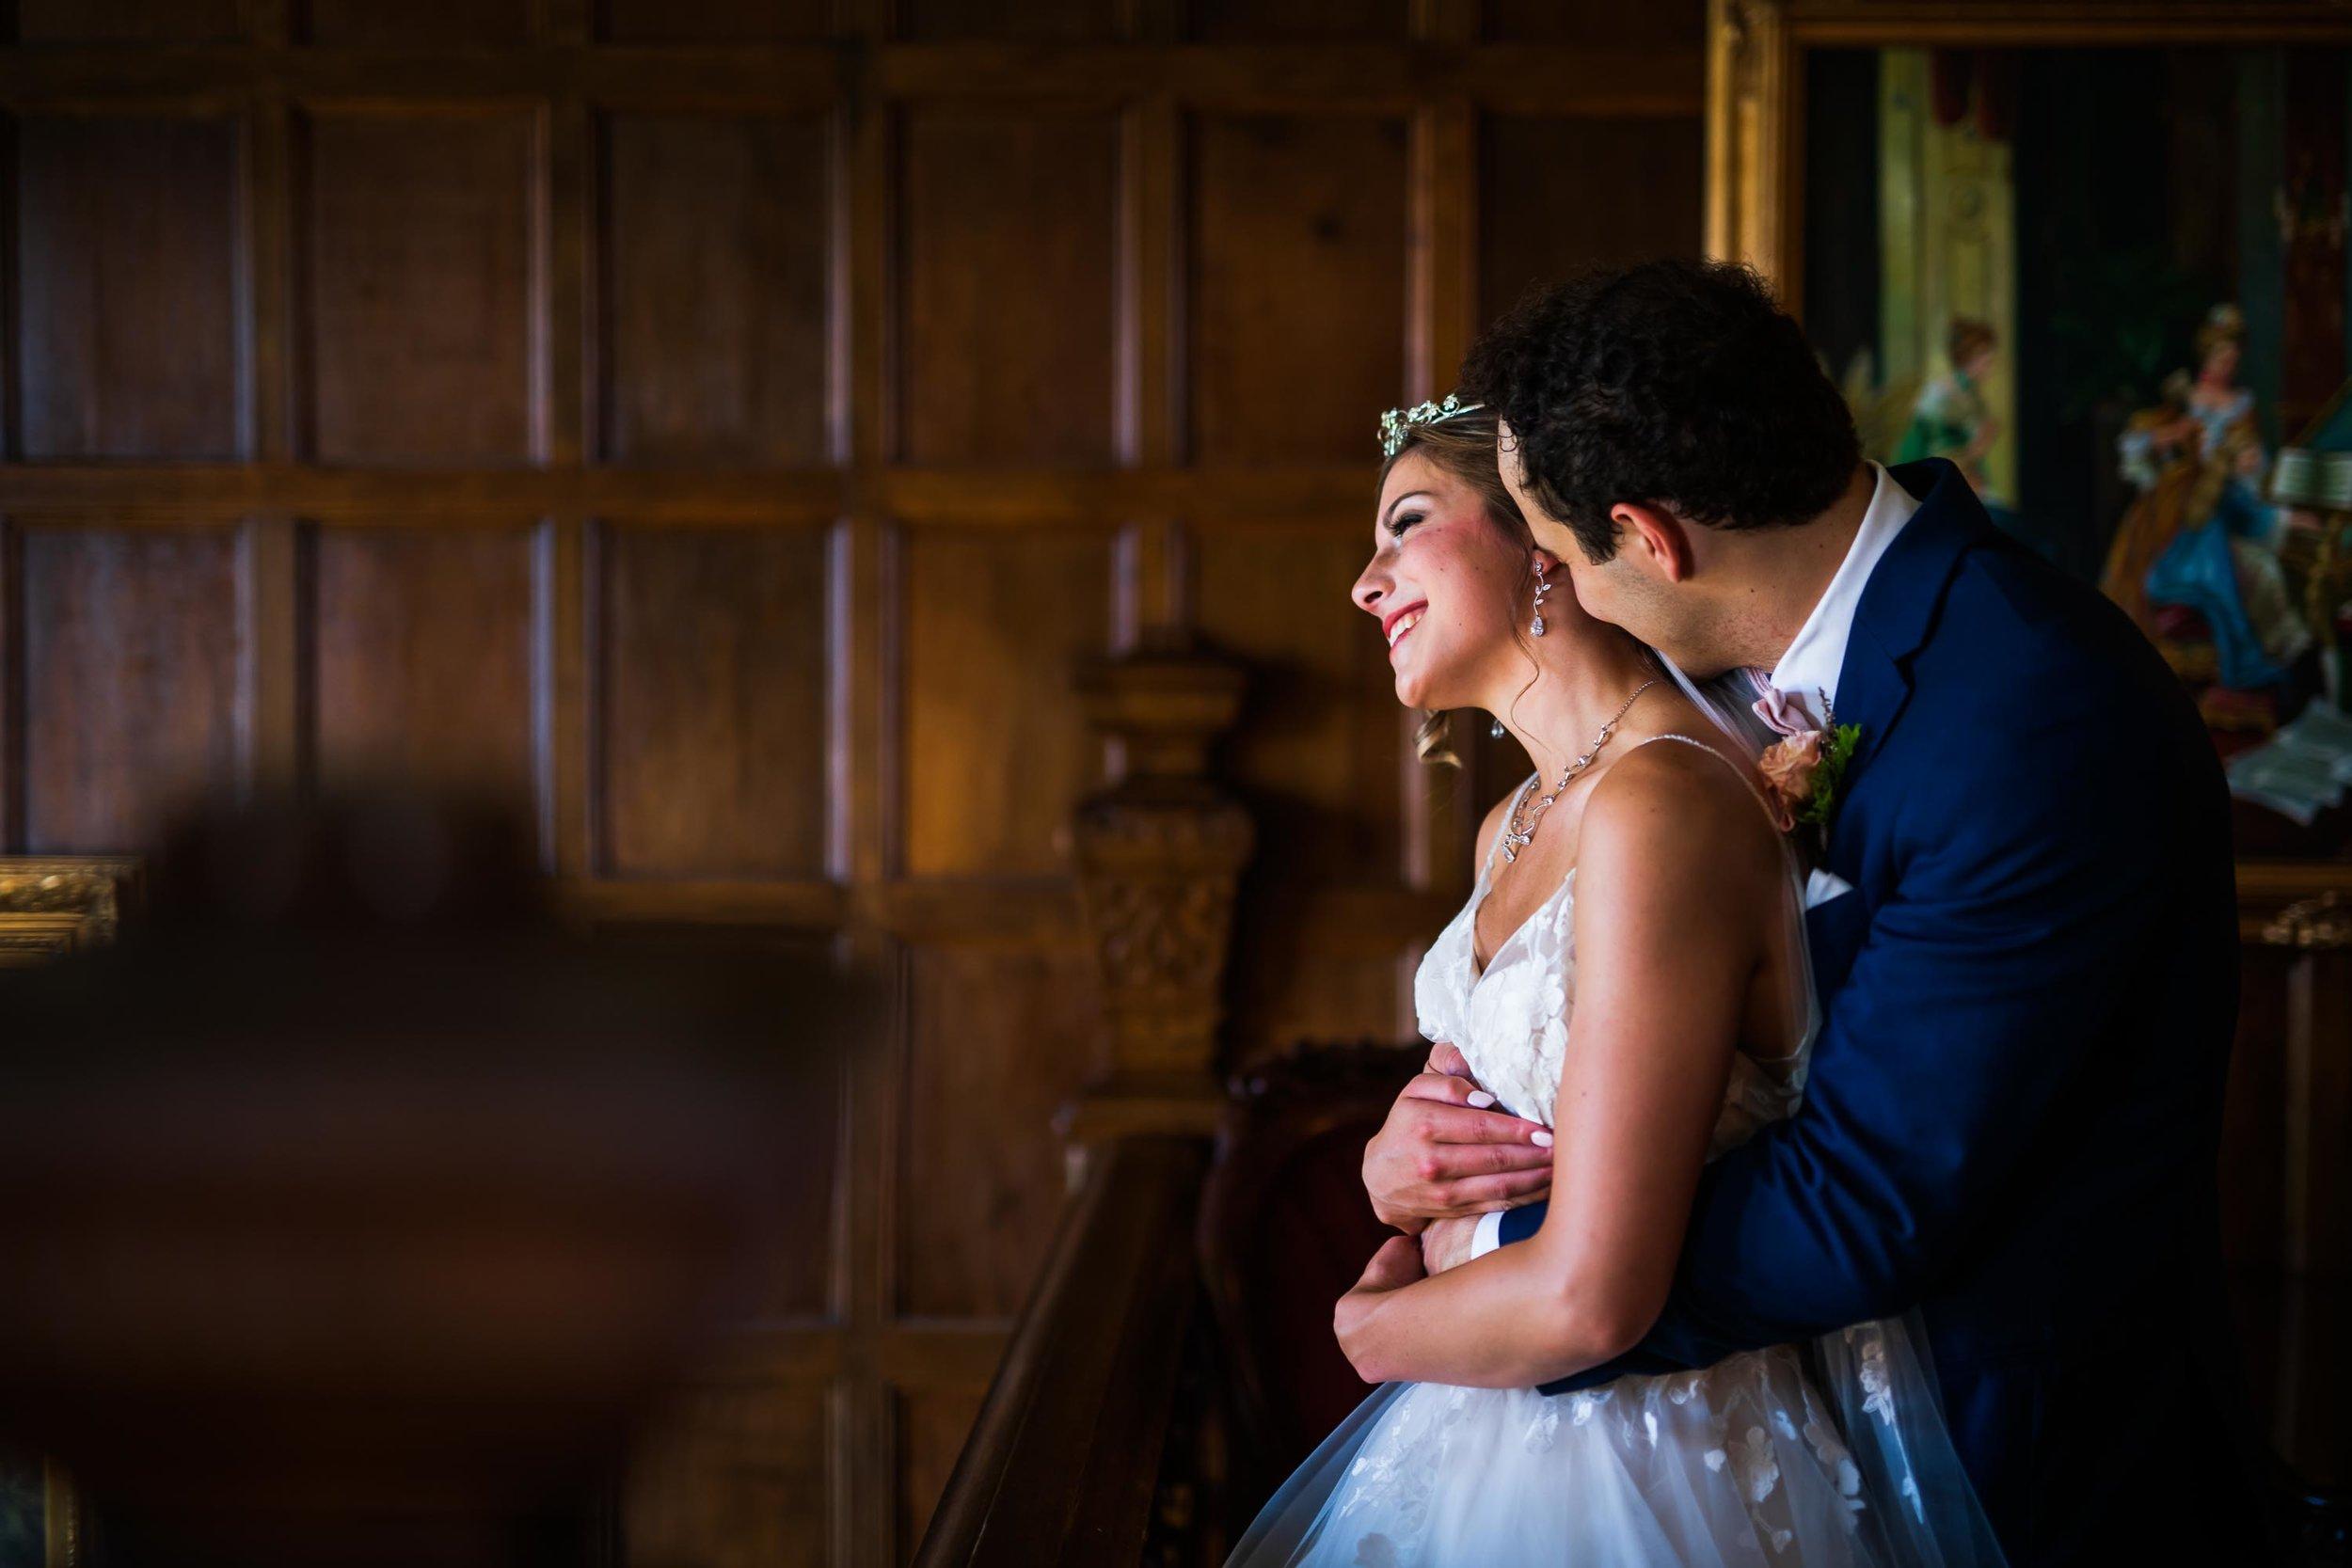 thornewood castle wedding 34.jpg